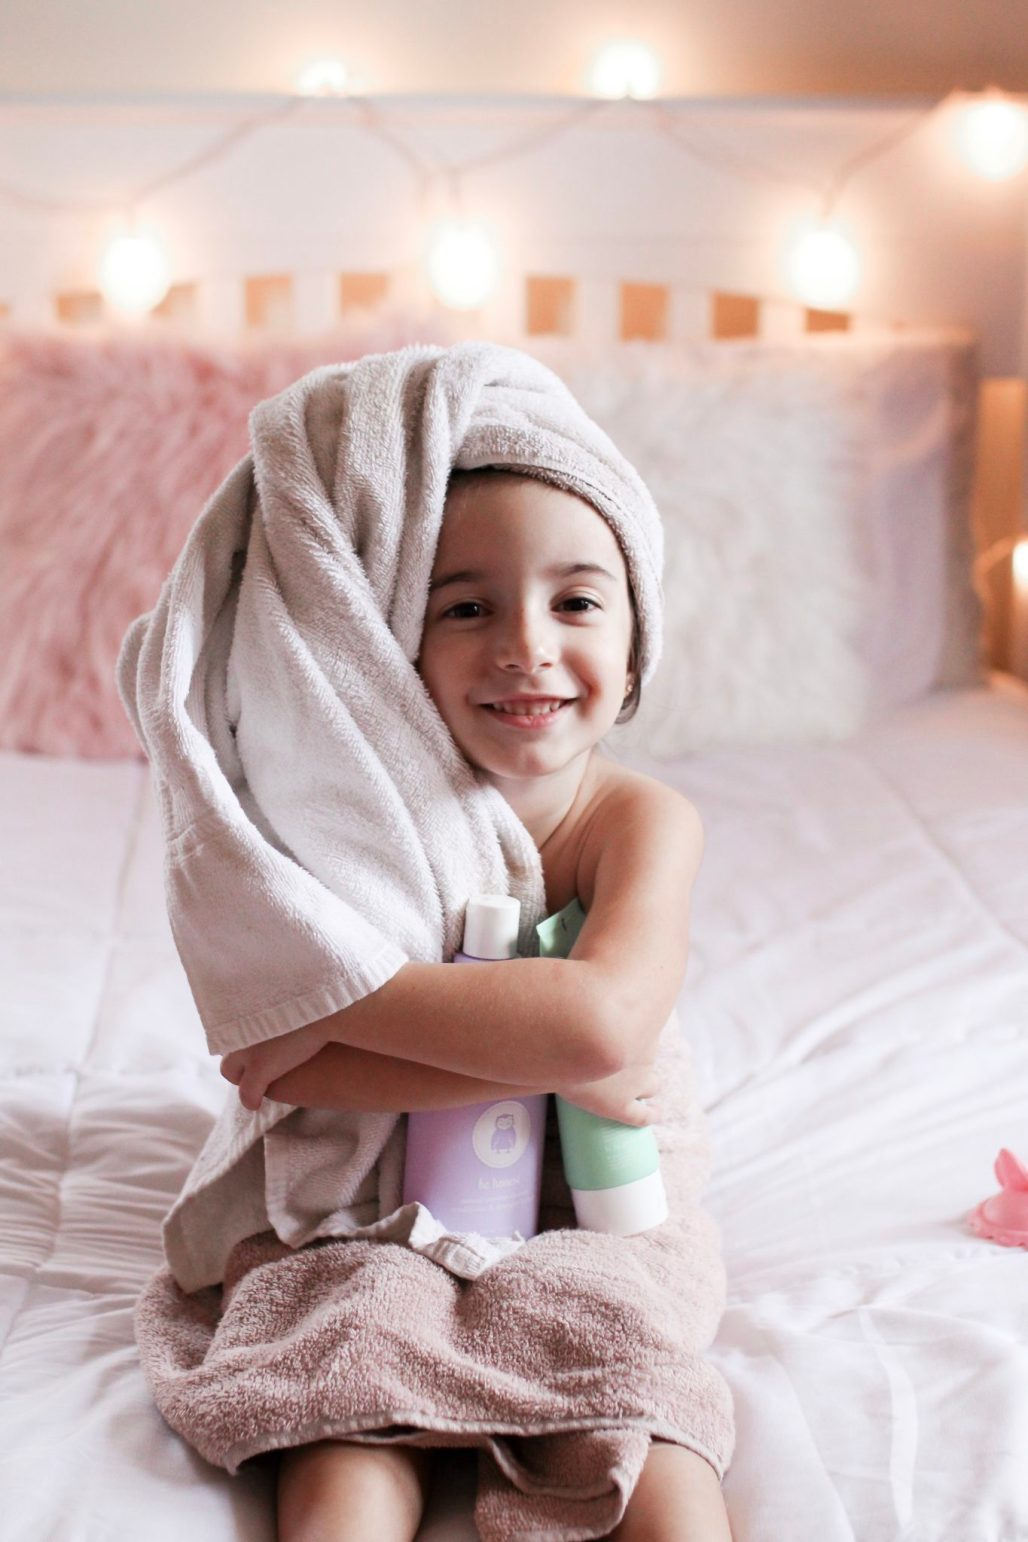 kids natural hair care line, natural personal care for kids, paraben free personal care, Be Good personal care line for kids